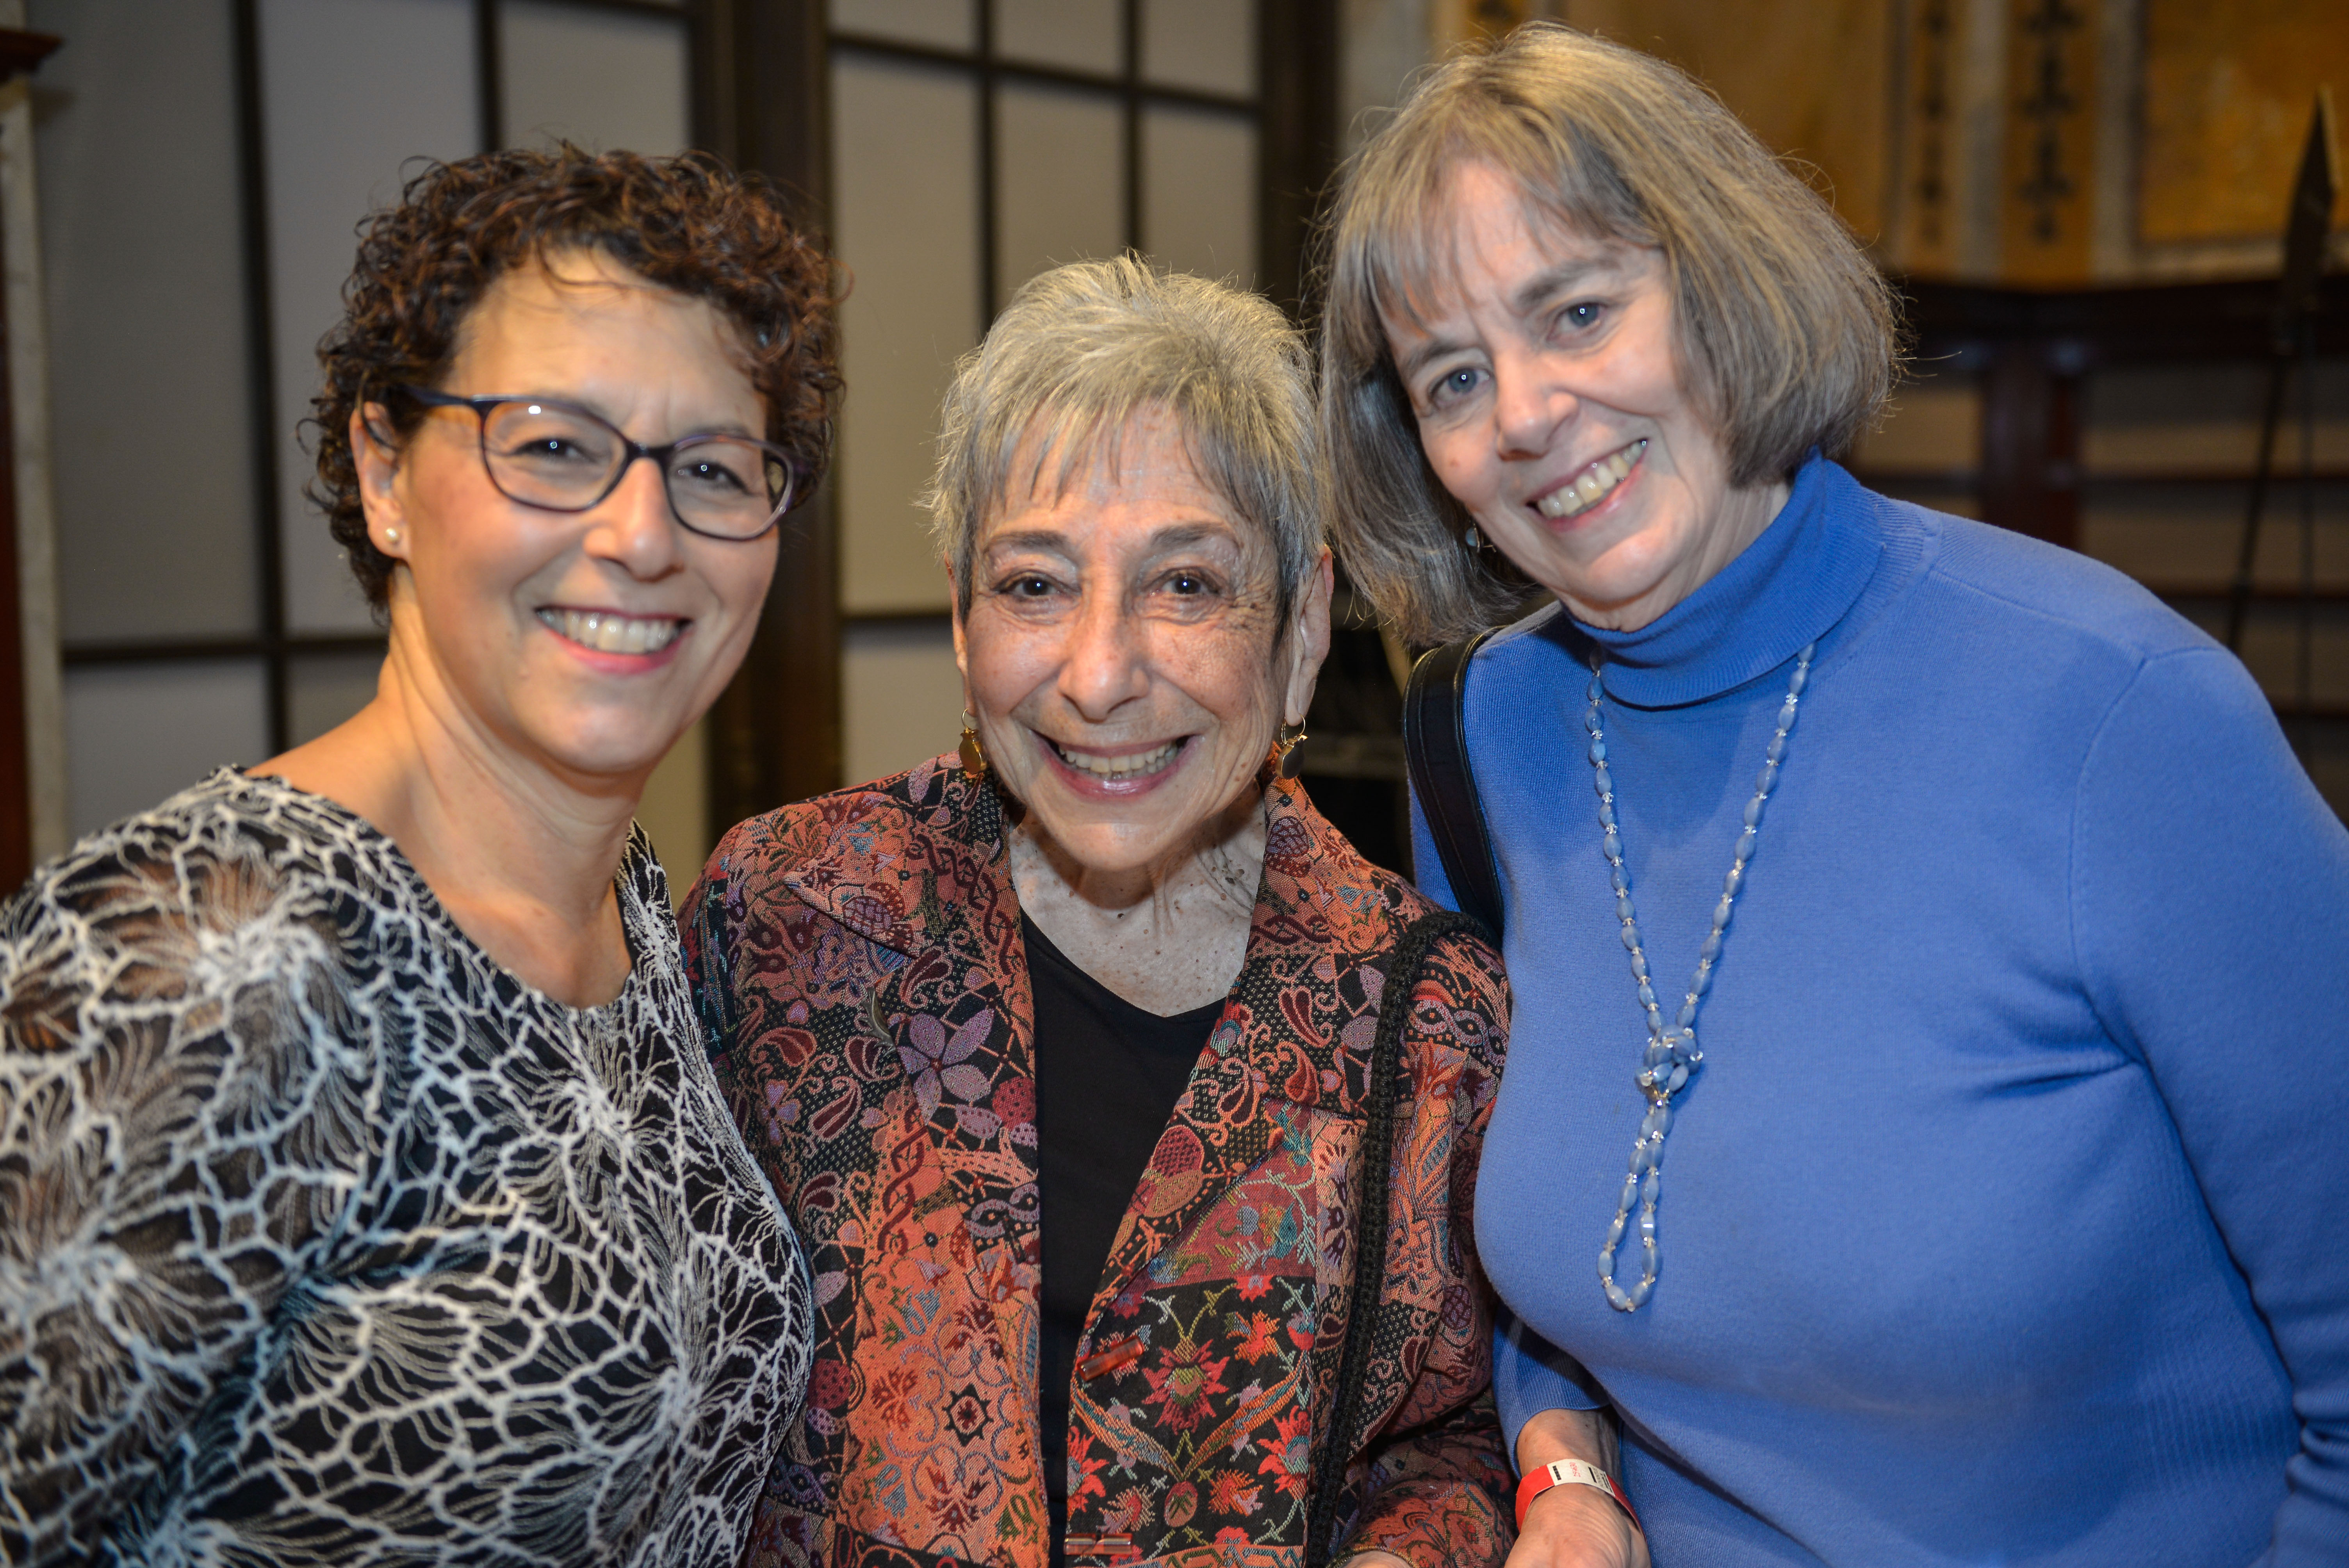 From left: 2017 Covenant Award recipient Jane Shapiro, 1995 Covenant Award Recipient Peninnah Schram and Covenant Board member Betsy Dolgin Katz.